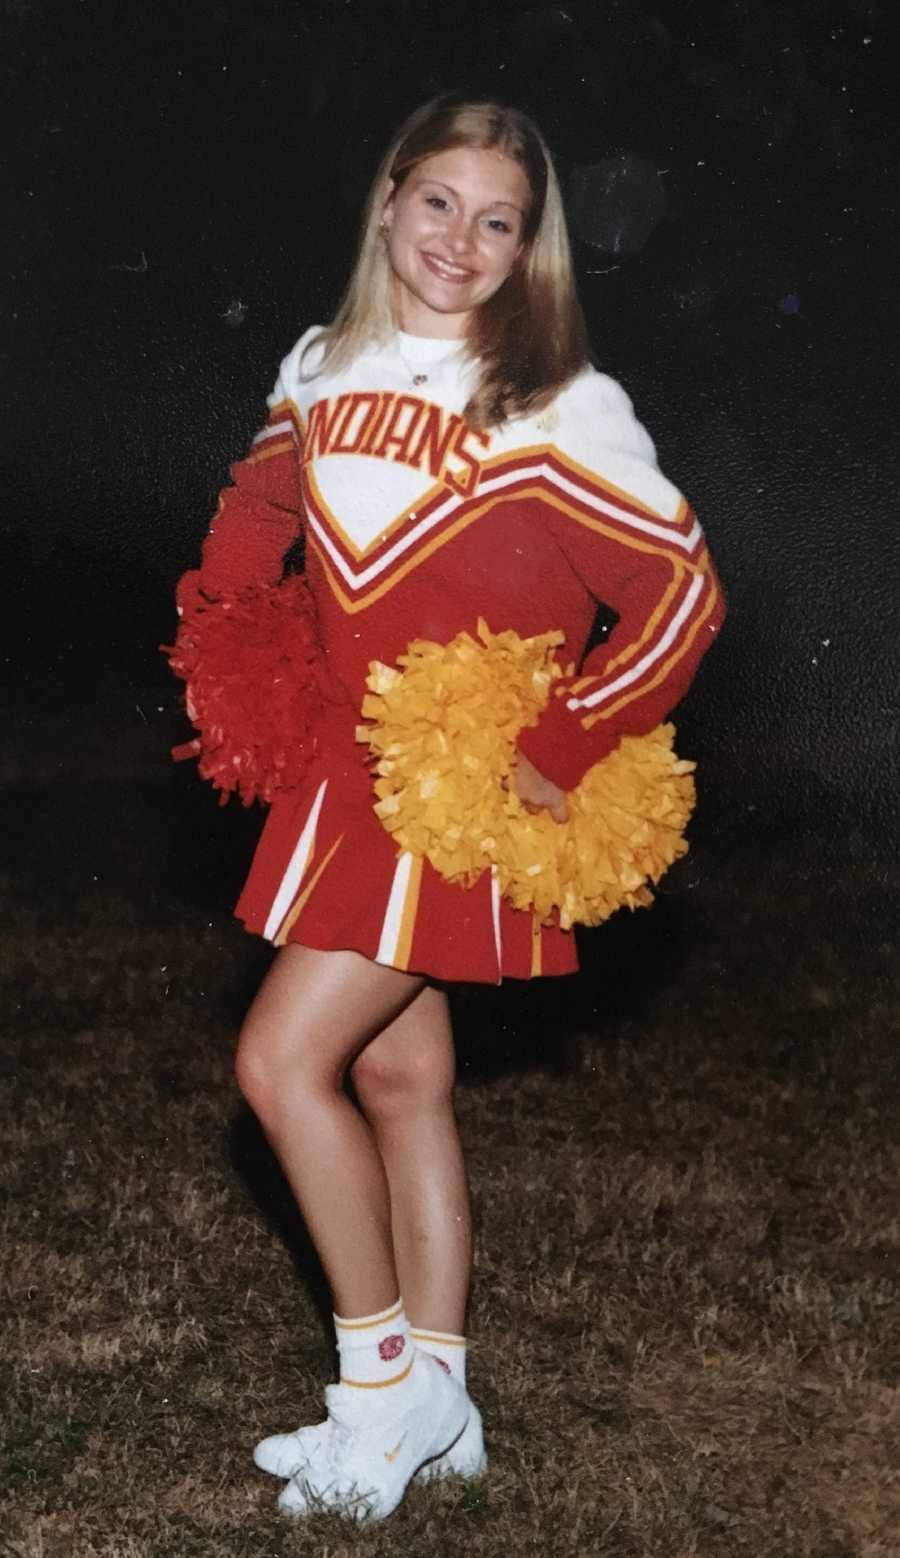 ASHLIE HARDWAY - Penn Hills High School - Varsity Cheerleading - 2001 - 2003